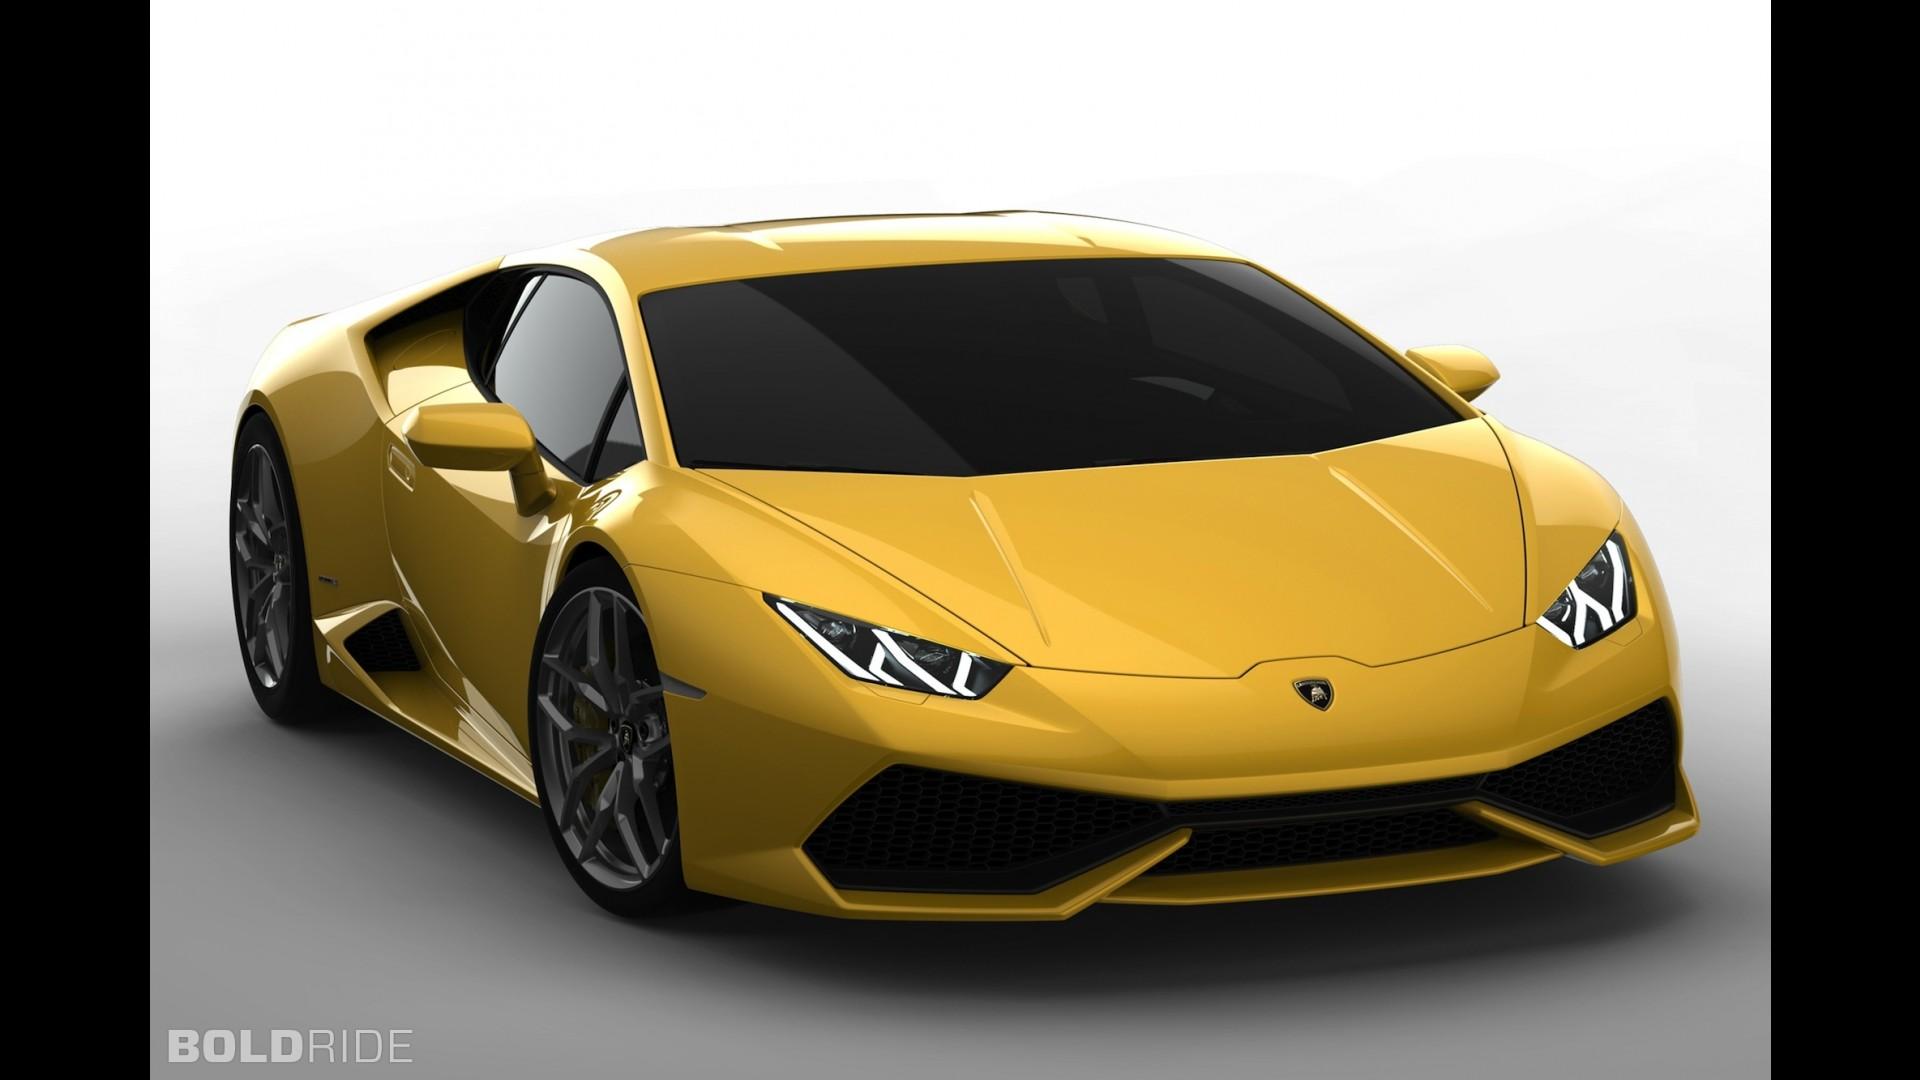 httpswwwmotor1comnews92415lamborghini huracan lamborghini general coupe italy 2015 sports car luxury v 10 - Sports Cars Lamborghini 2015